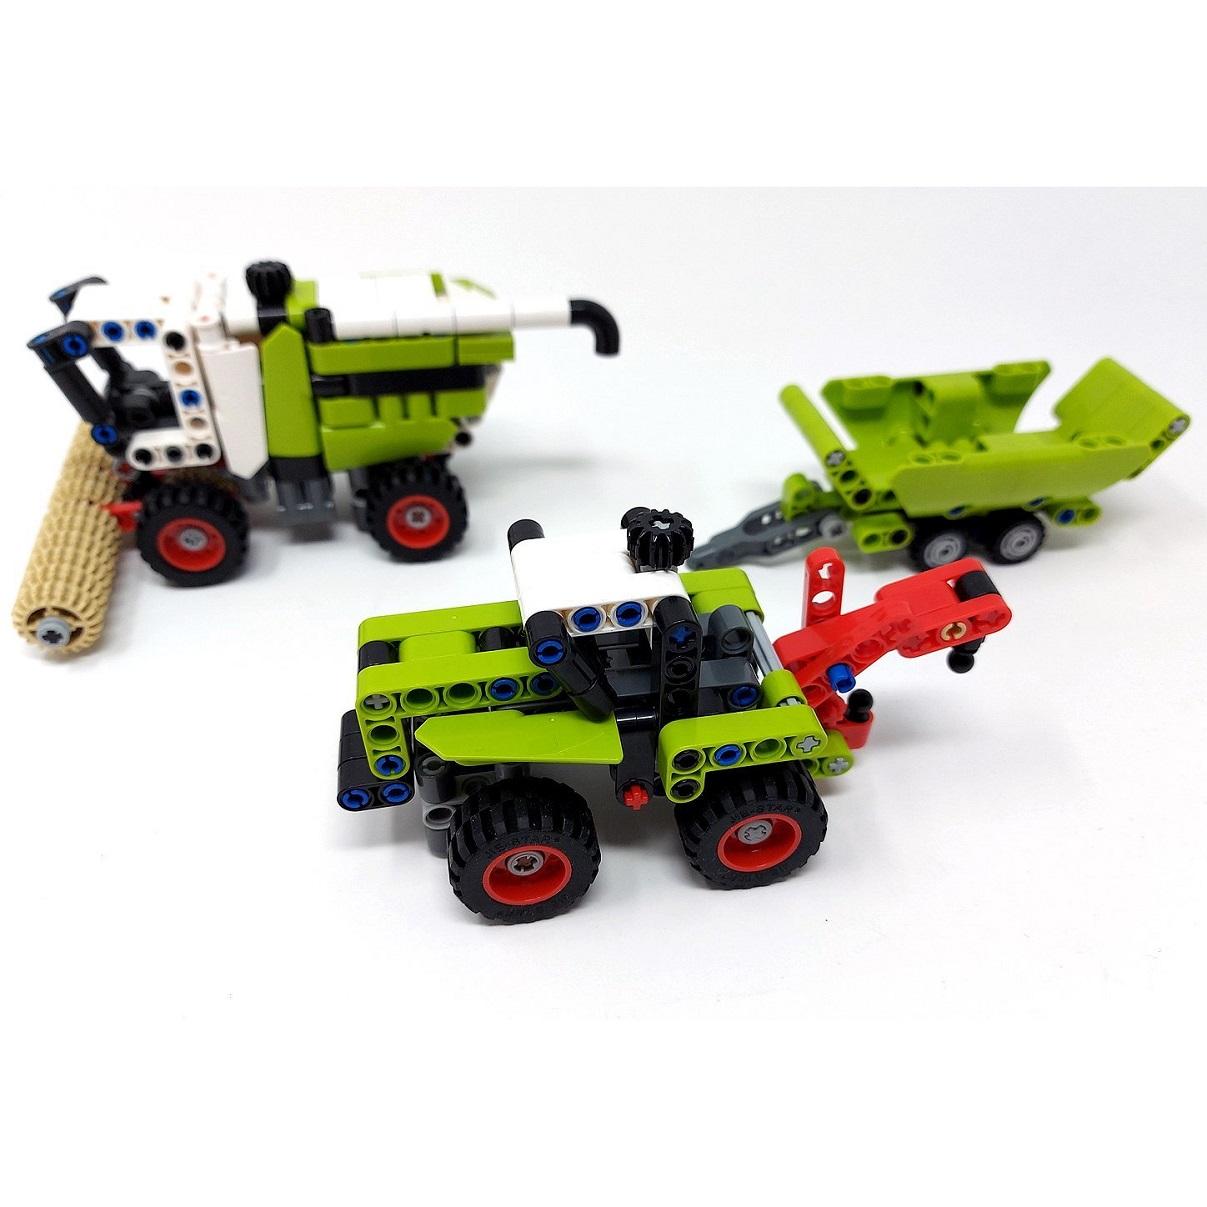 Resi, i hol di mit'm Traktor ab...